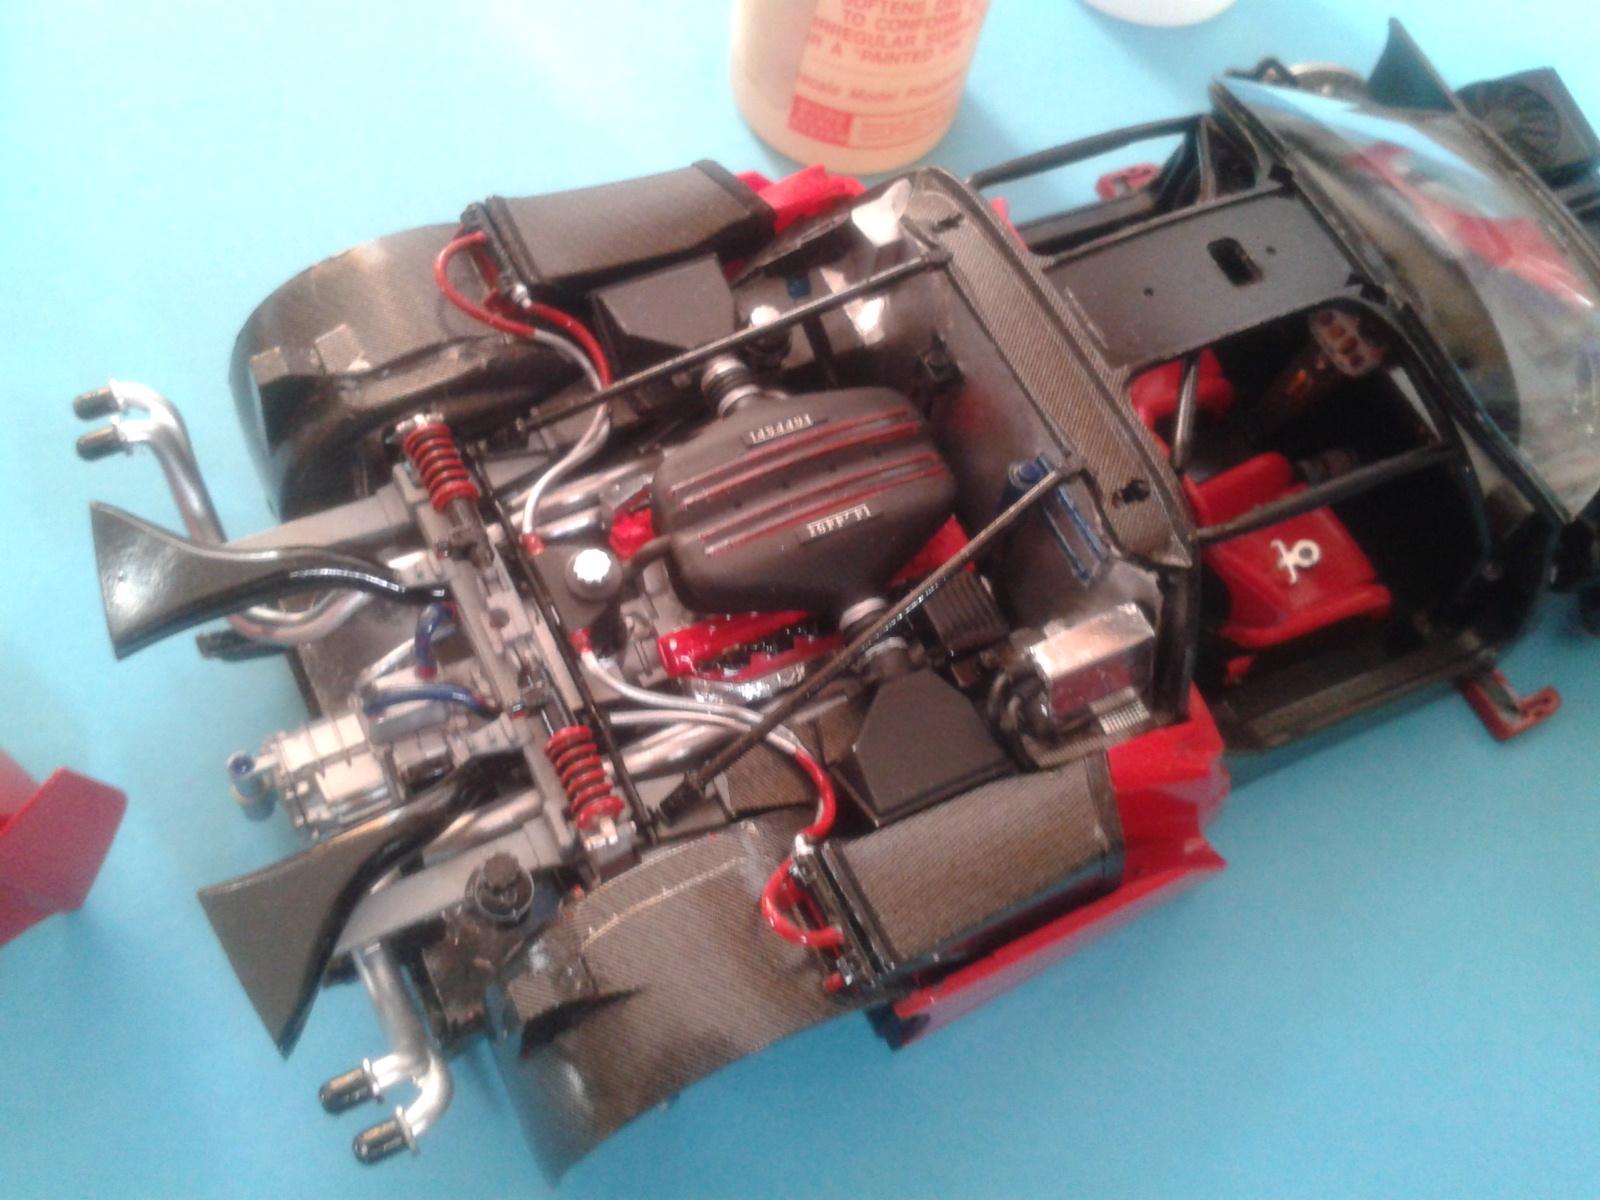 Ferrari FXX ...Tamiya 1/24... Reprise du montage !!!!!! 20130403183713